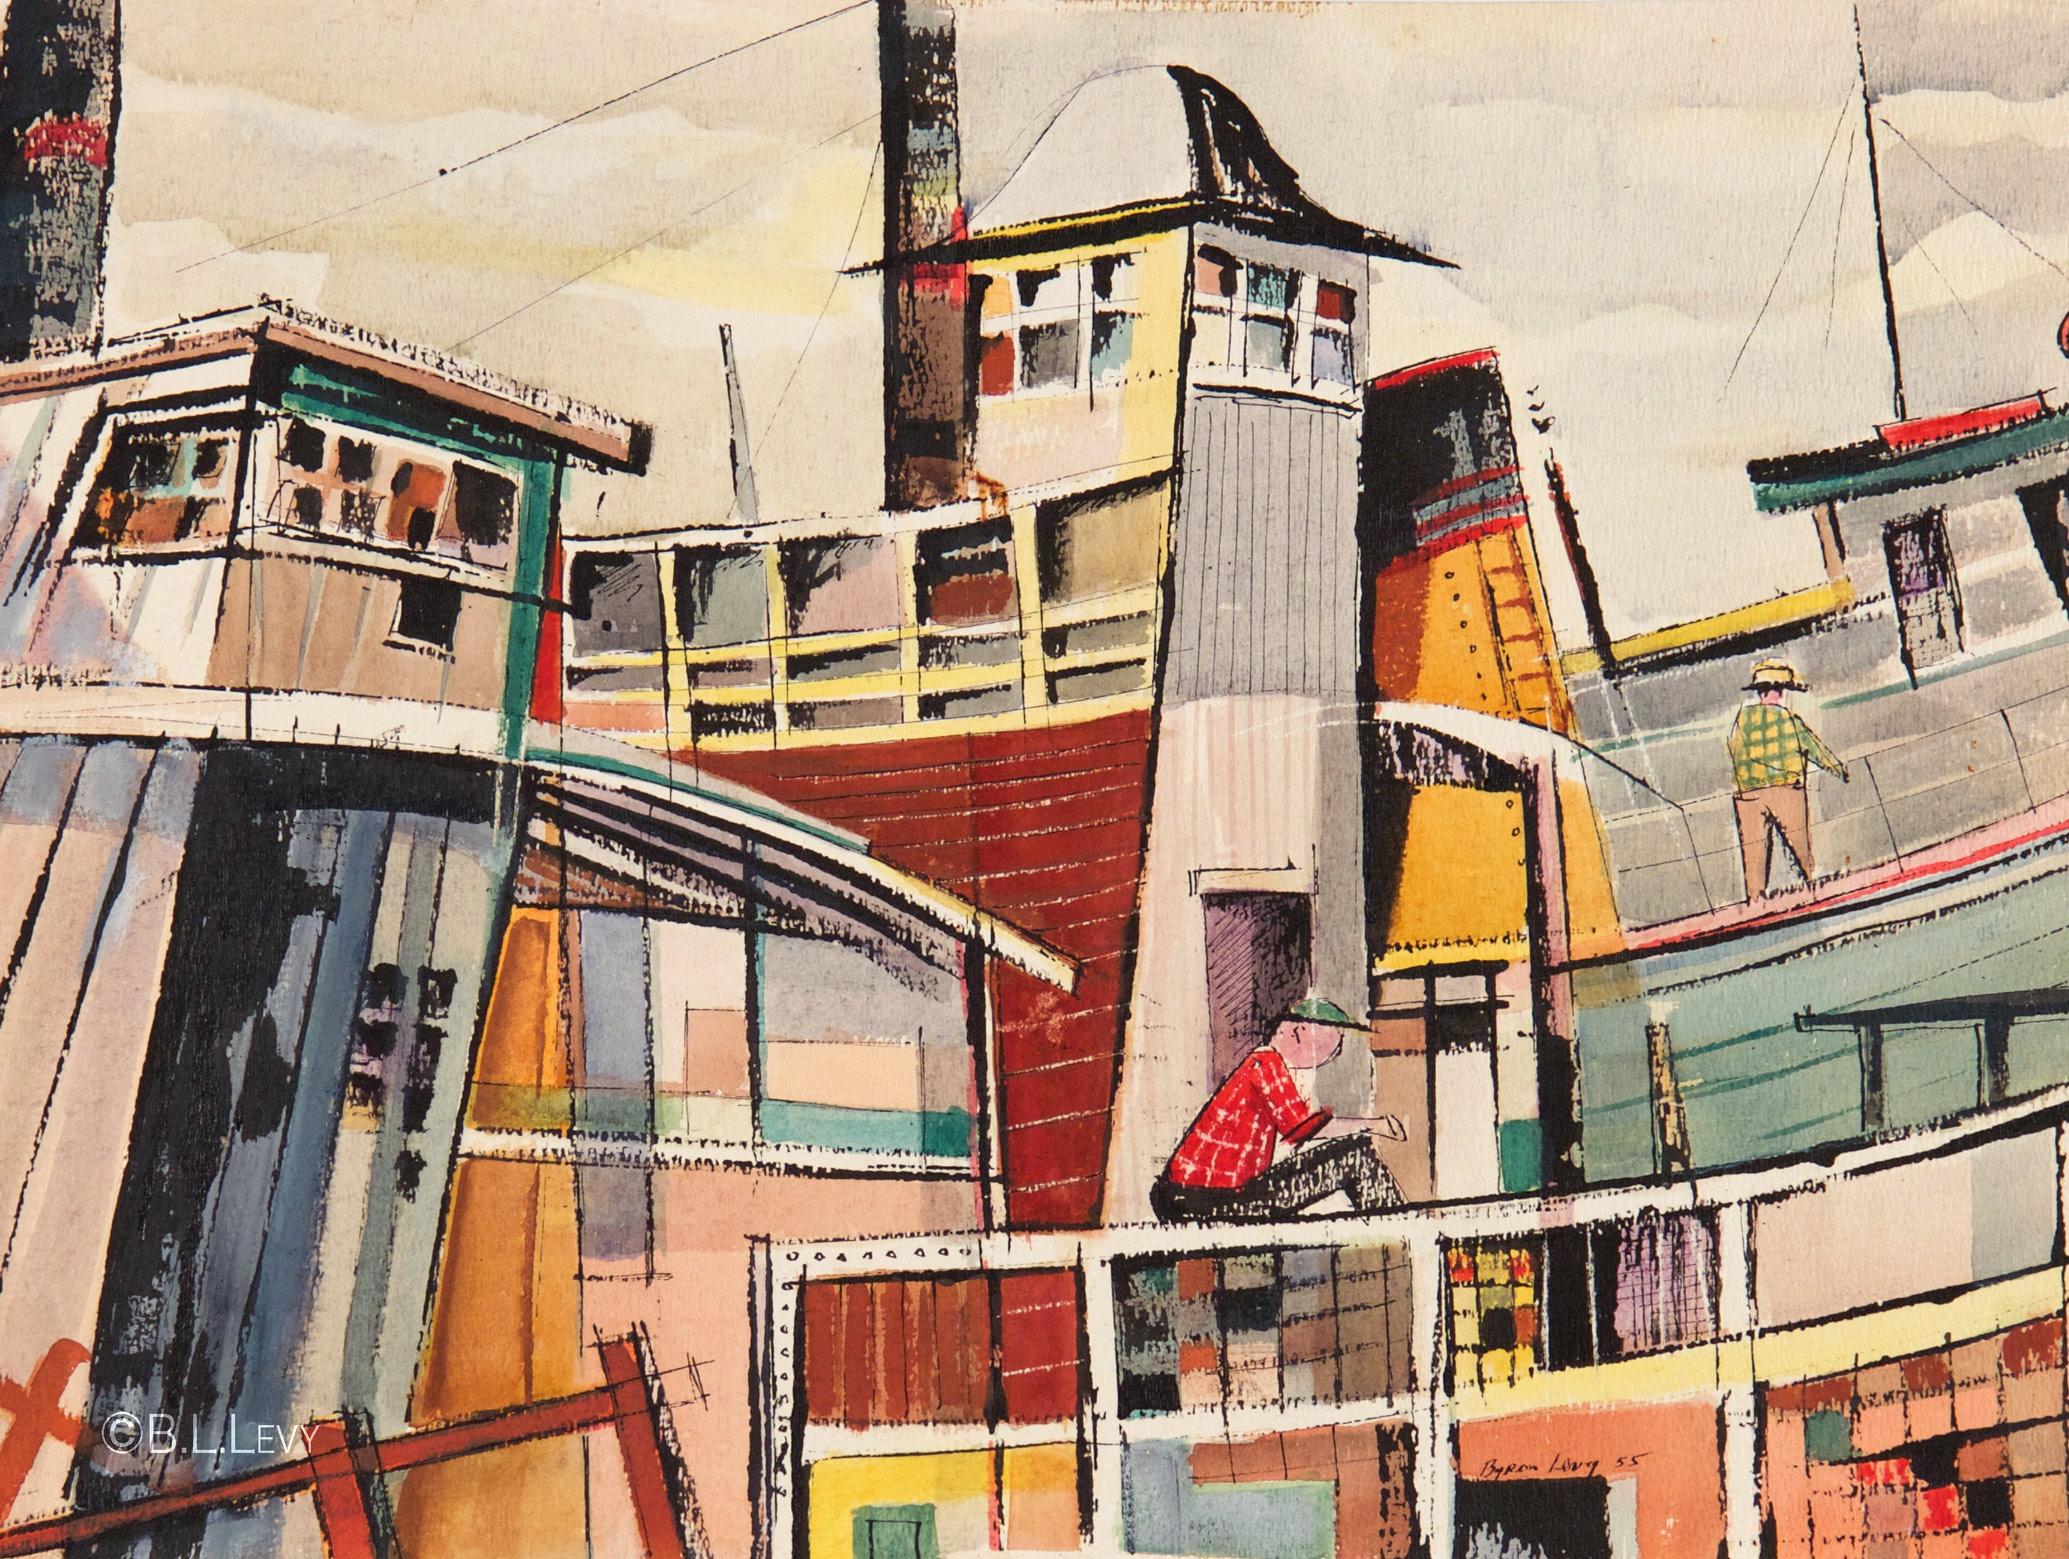 Shipyard-Plaids-copy1.jpg